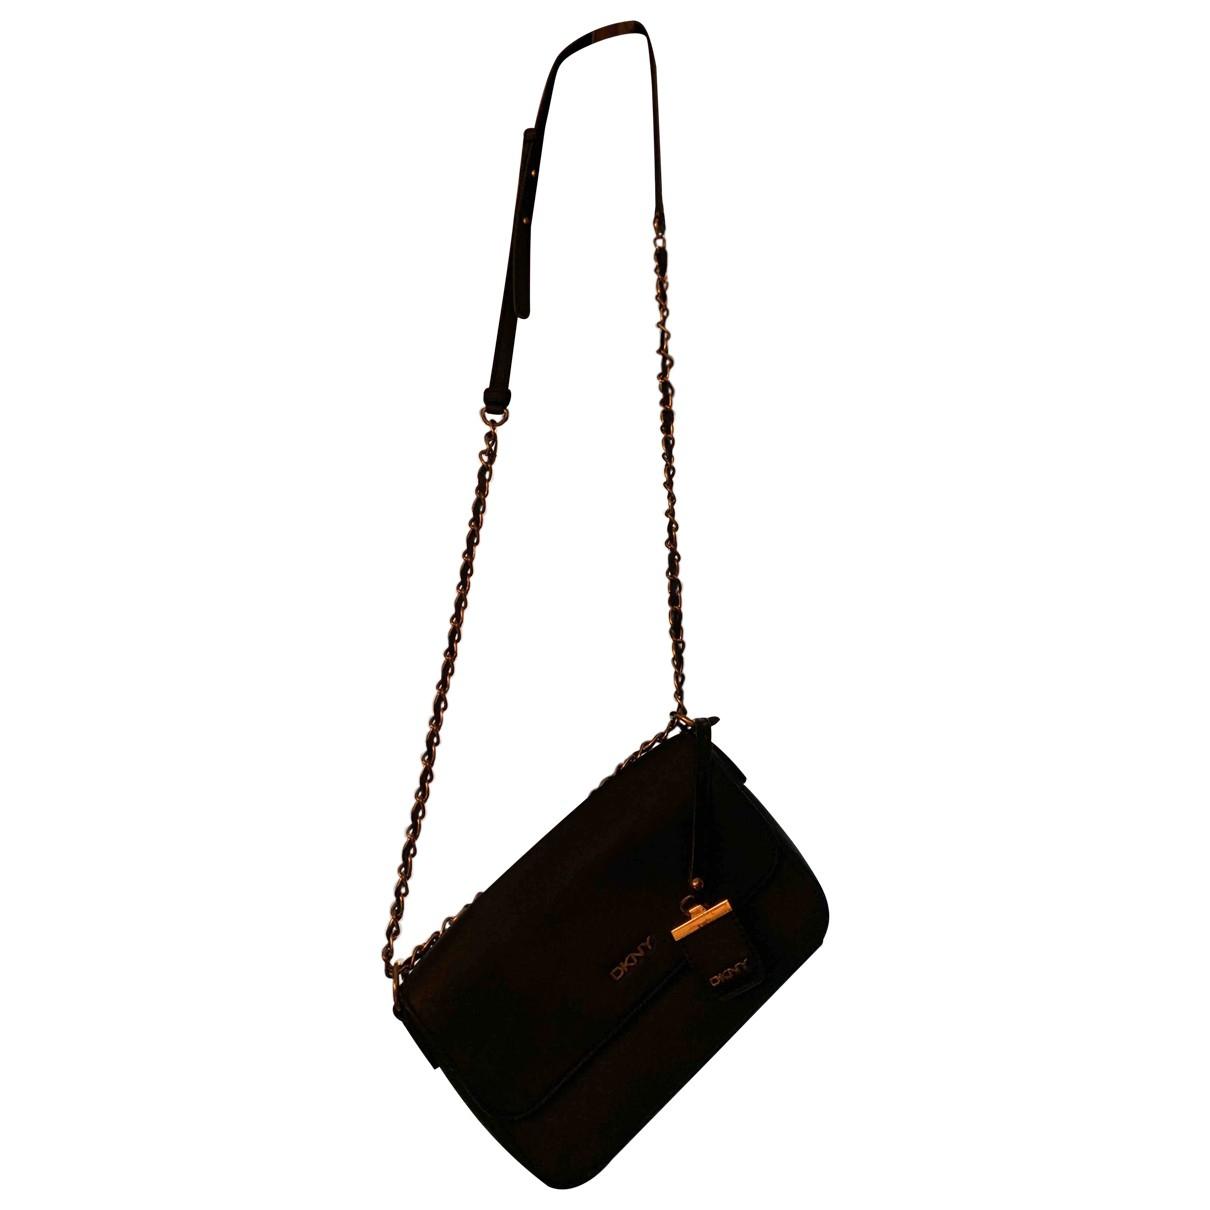 Dkny \N Black Leather Clutch bag for Women \N